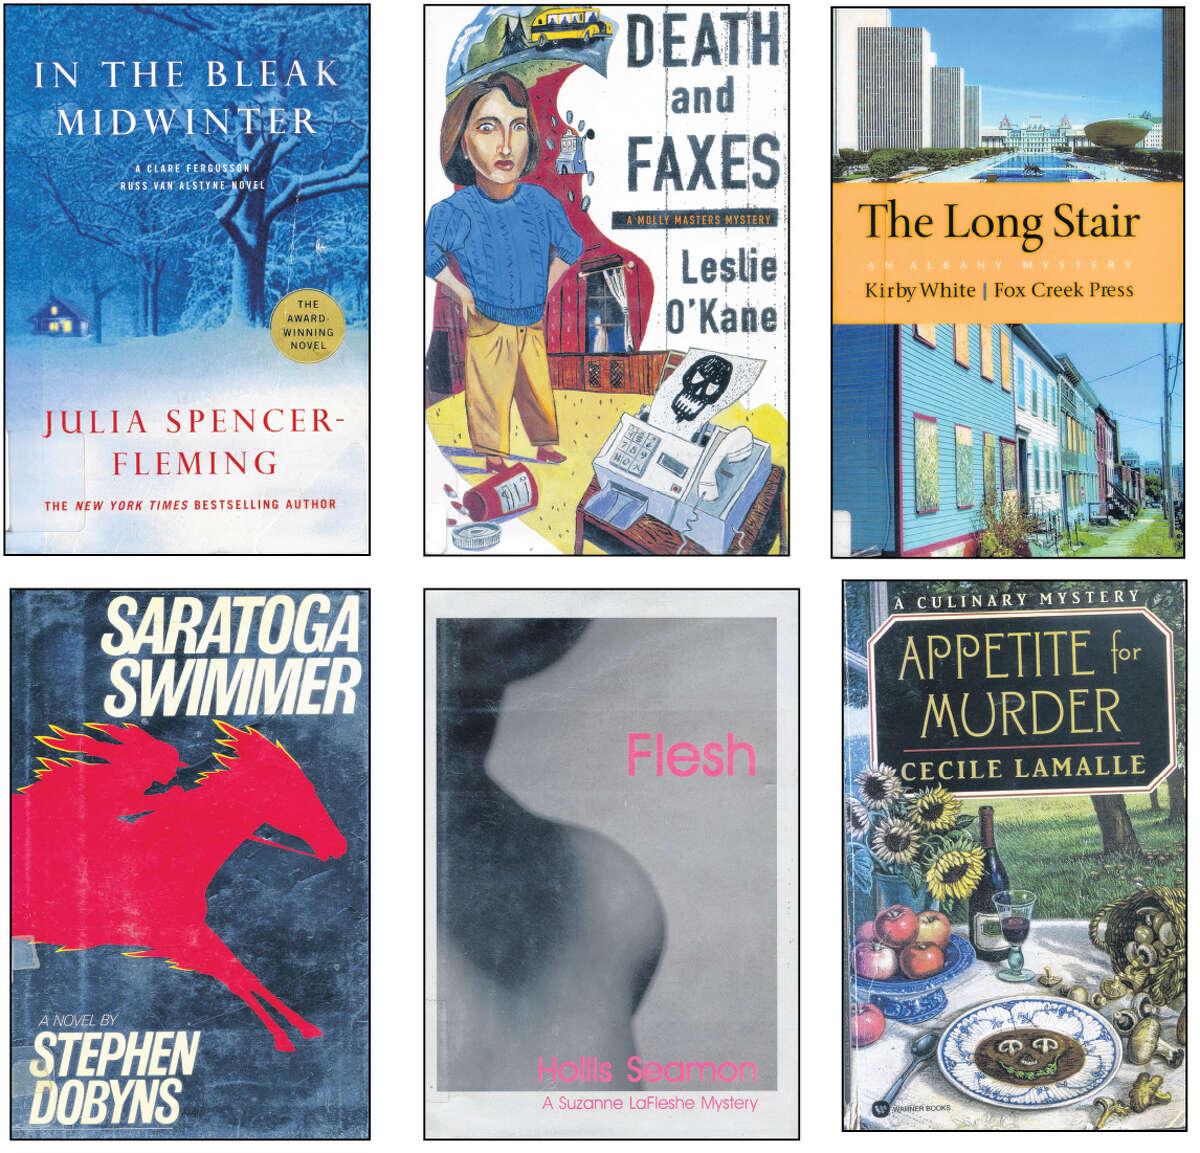 Murder mystery books.